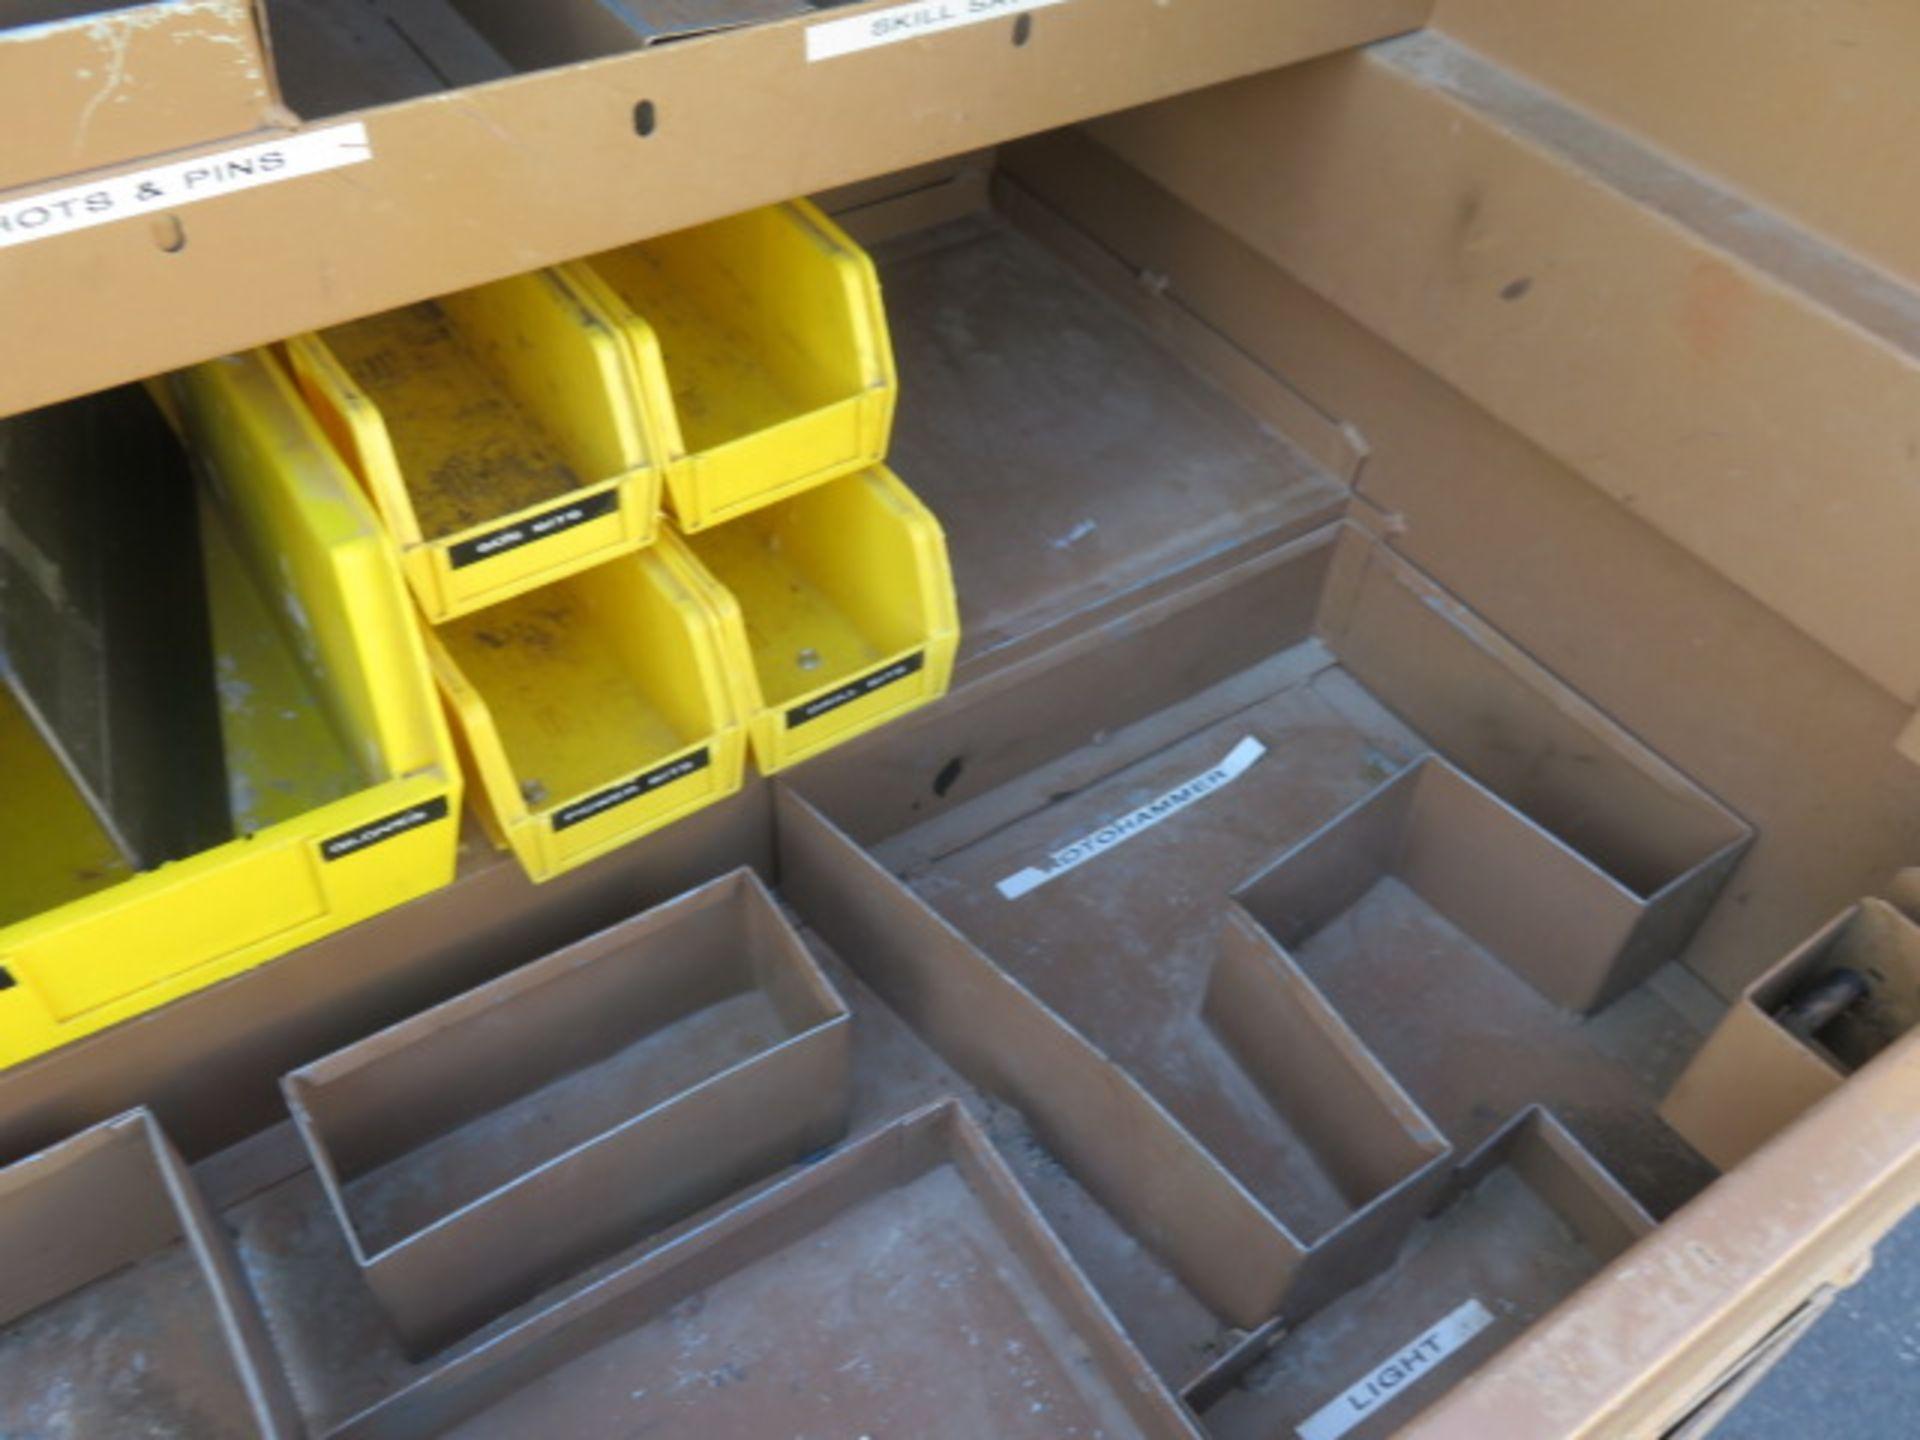 Knaack mdl. 89 Storagemaster Rolling Job Box (SOLD AS-IS - NO WARRANTY) - Image 8 of 12